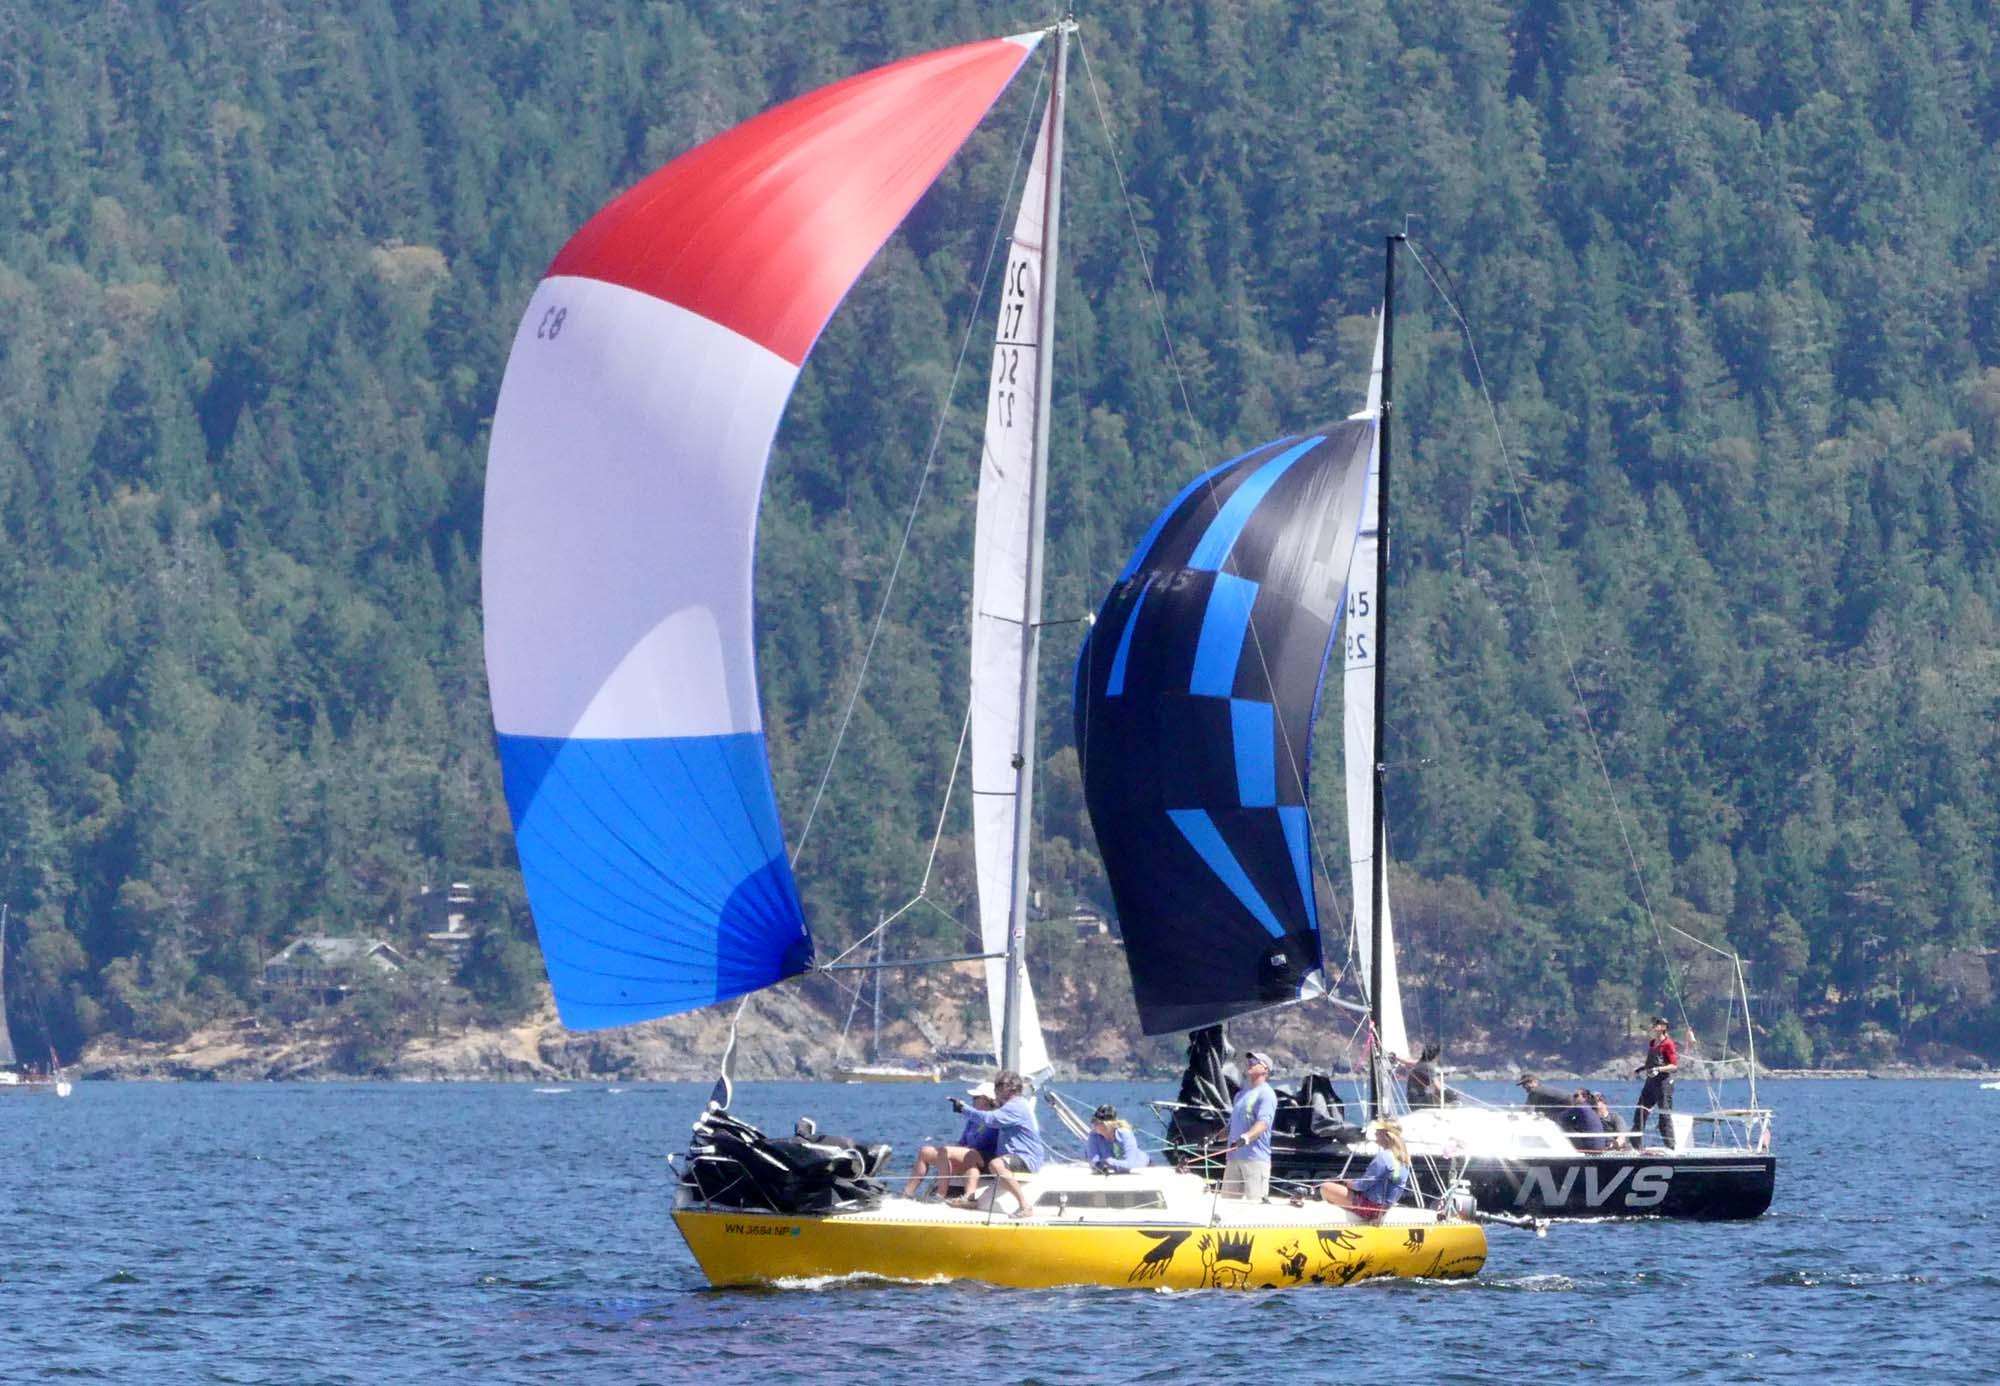 Cowichan Bay Report – Northwest Multihull Championship